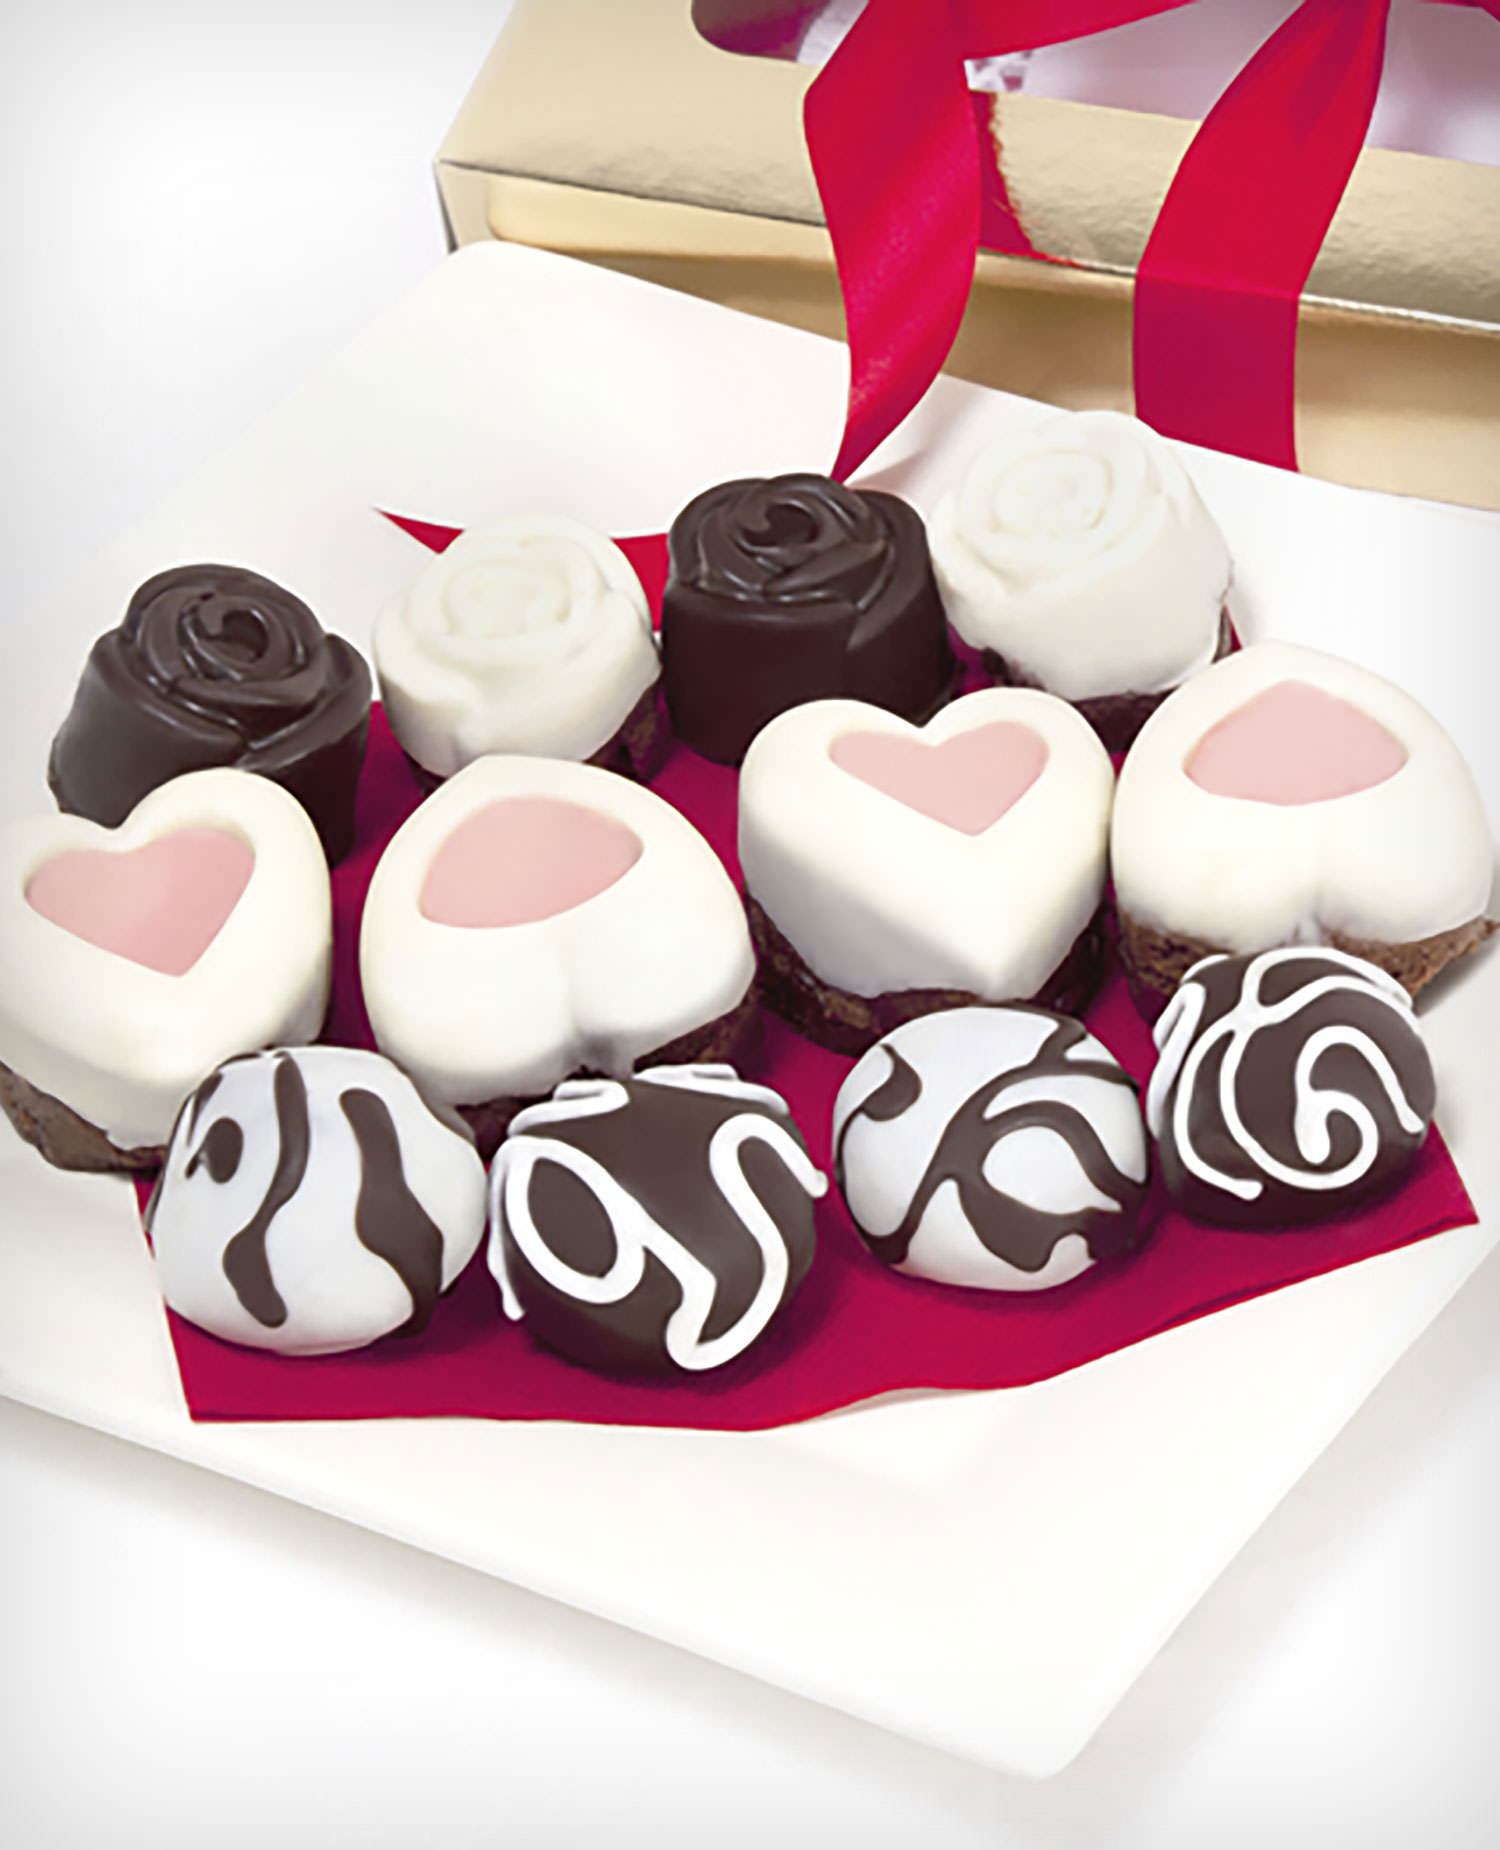 Božské dorty - rozvoz, dárek